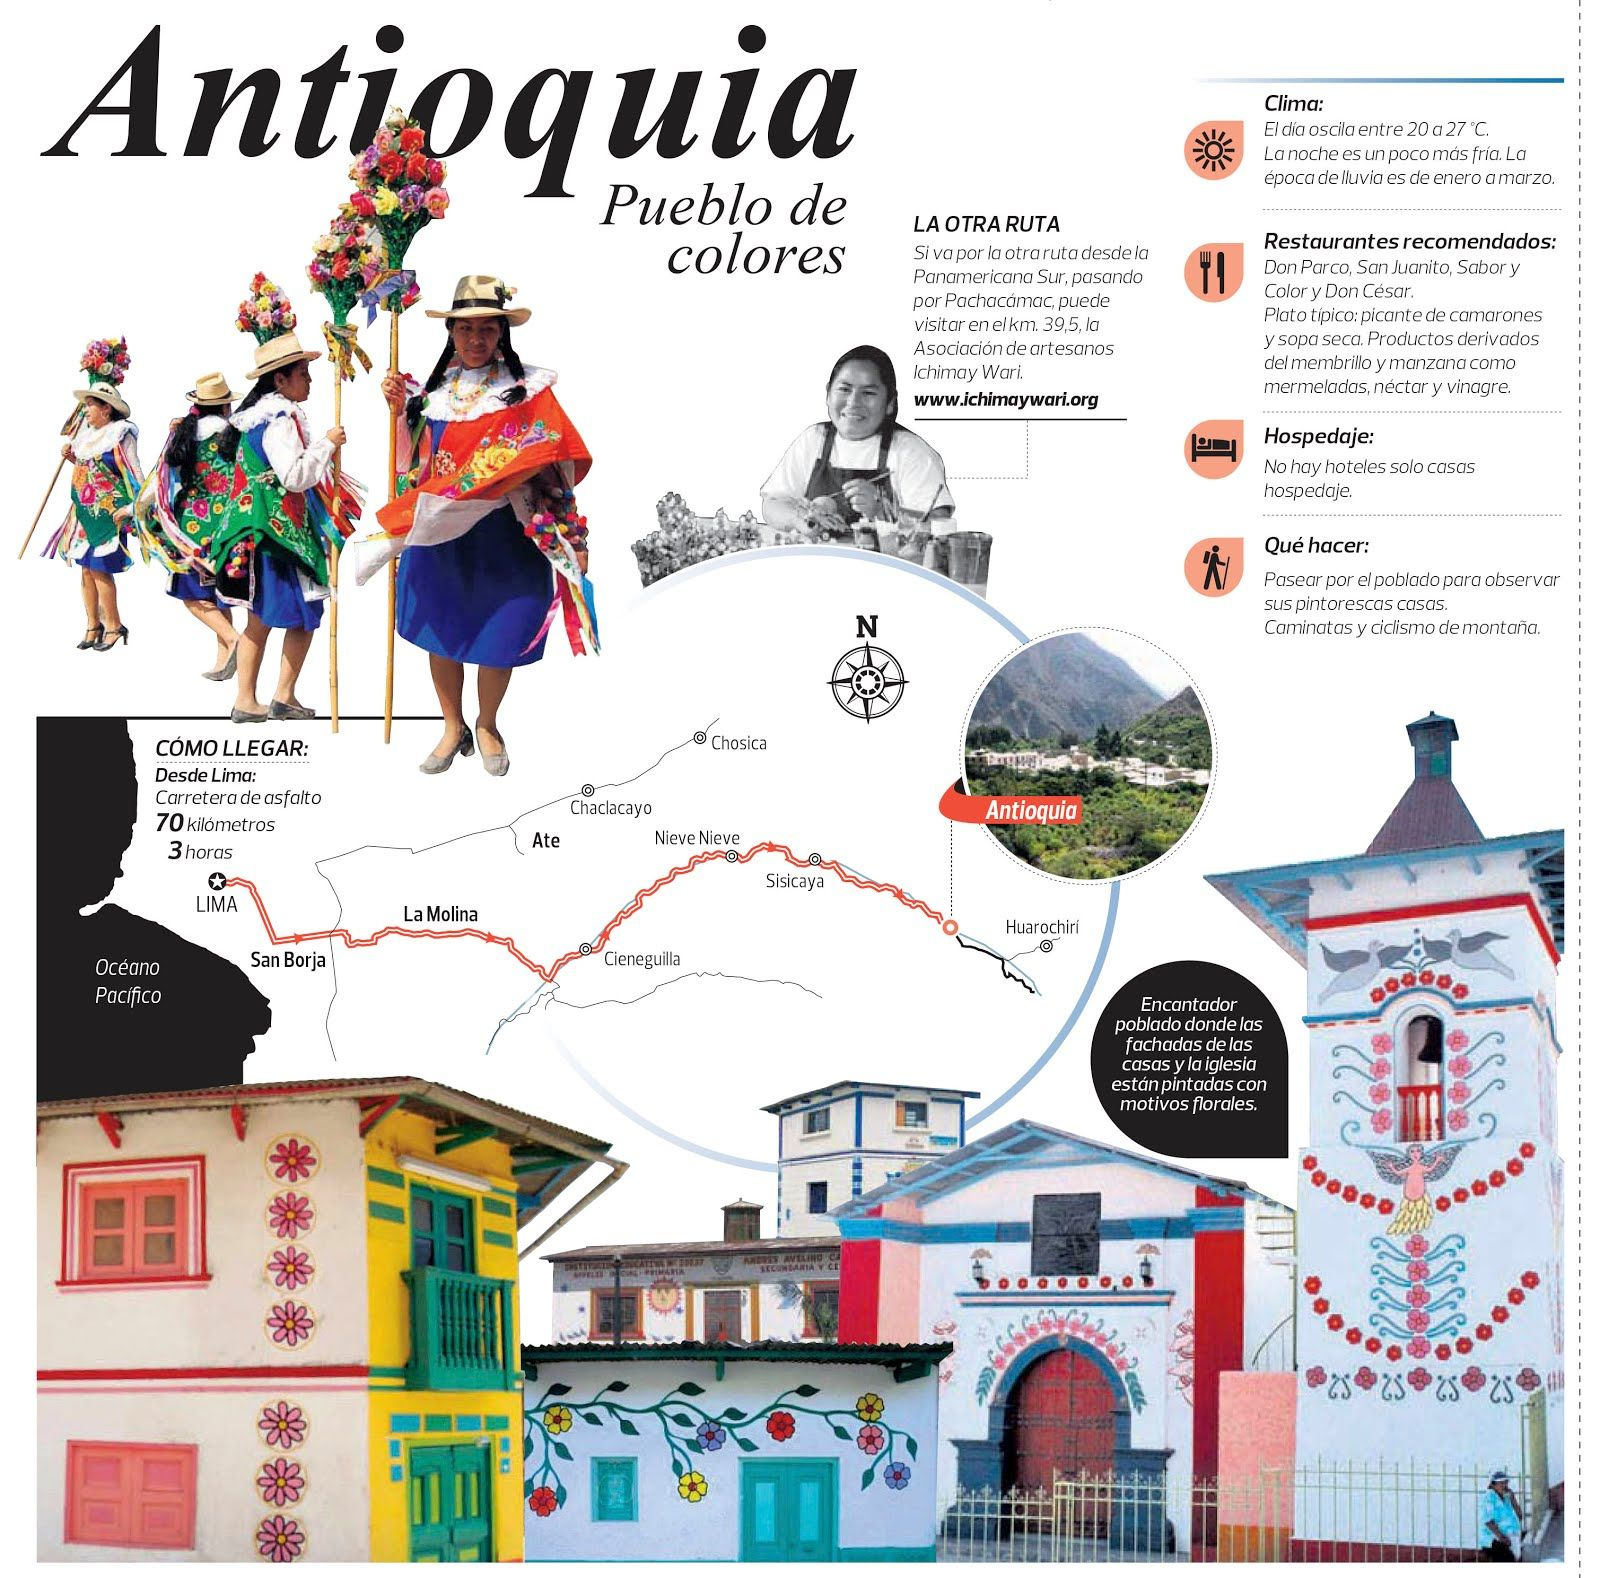 Peru Travel Tips Common Peruvian Phrases For Travel: Antioquia Perú